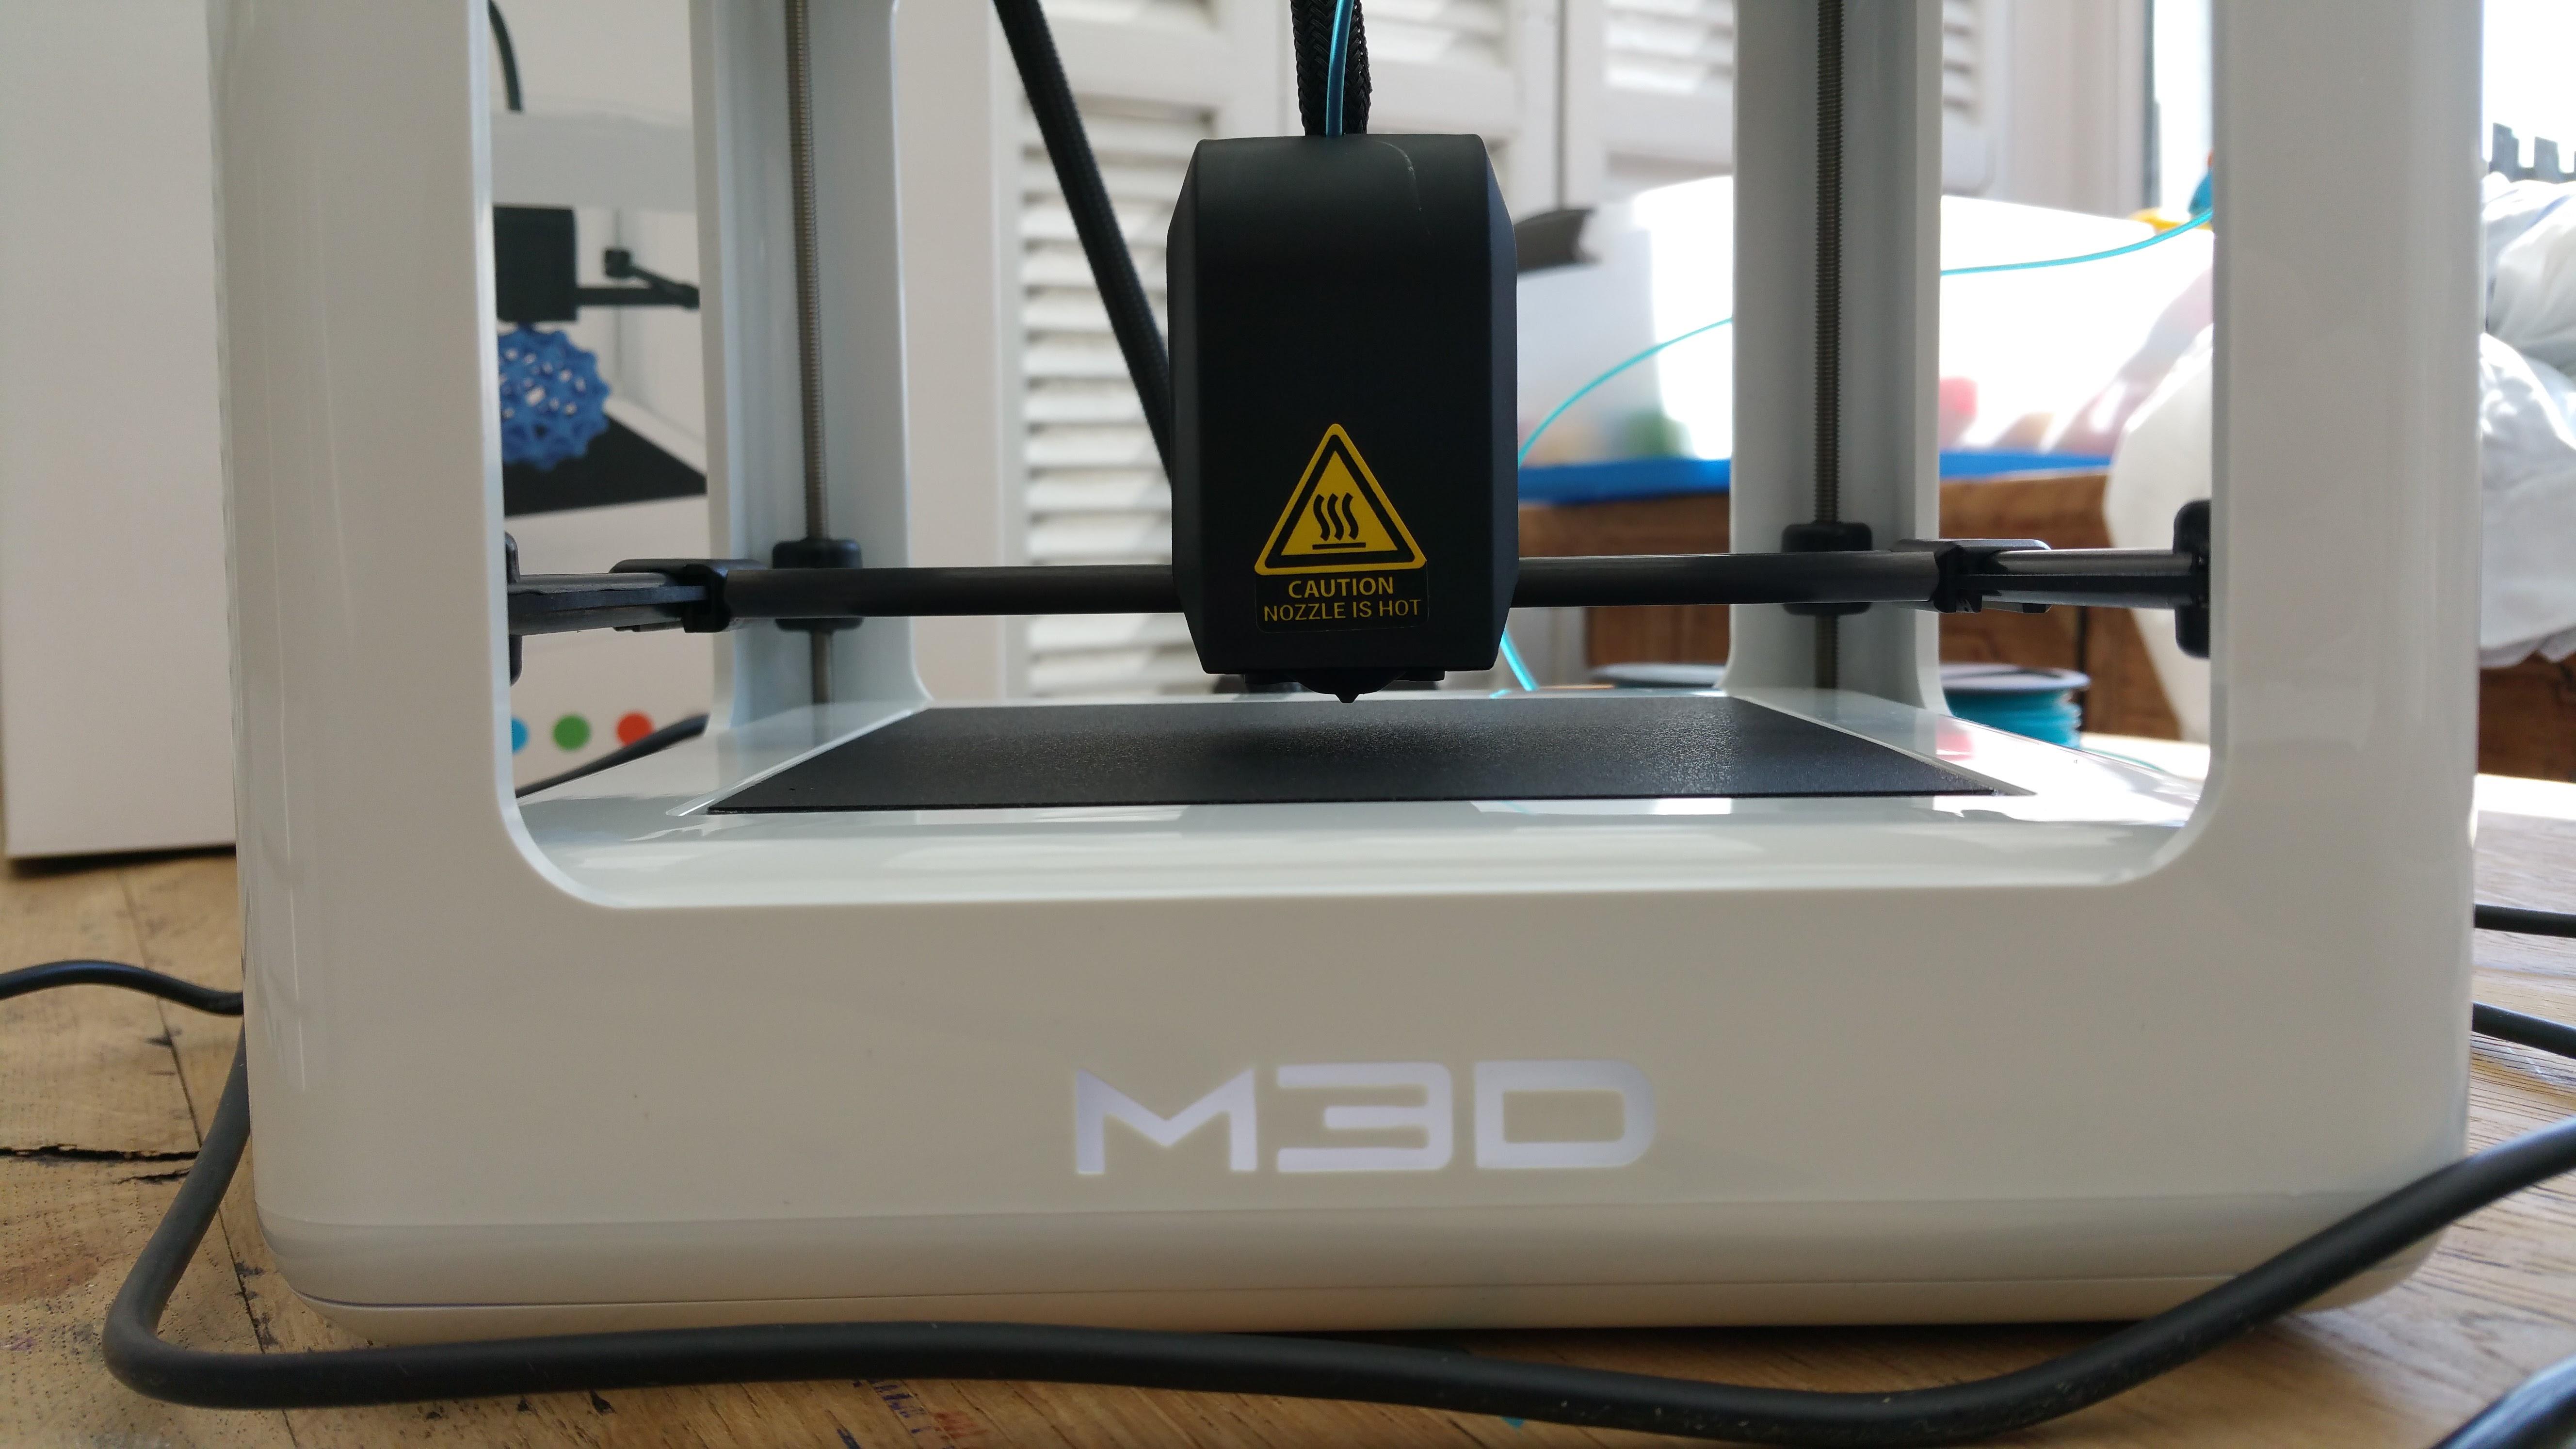 Illumarco_3D Printing_Micro M3D Printer (0).jpg